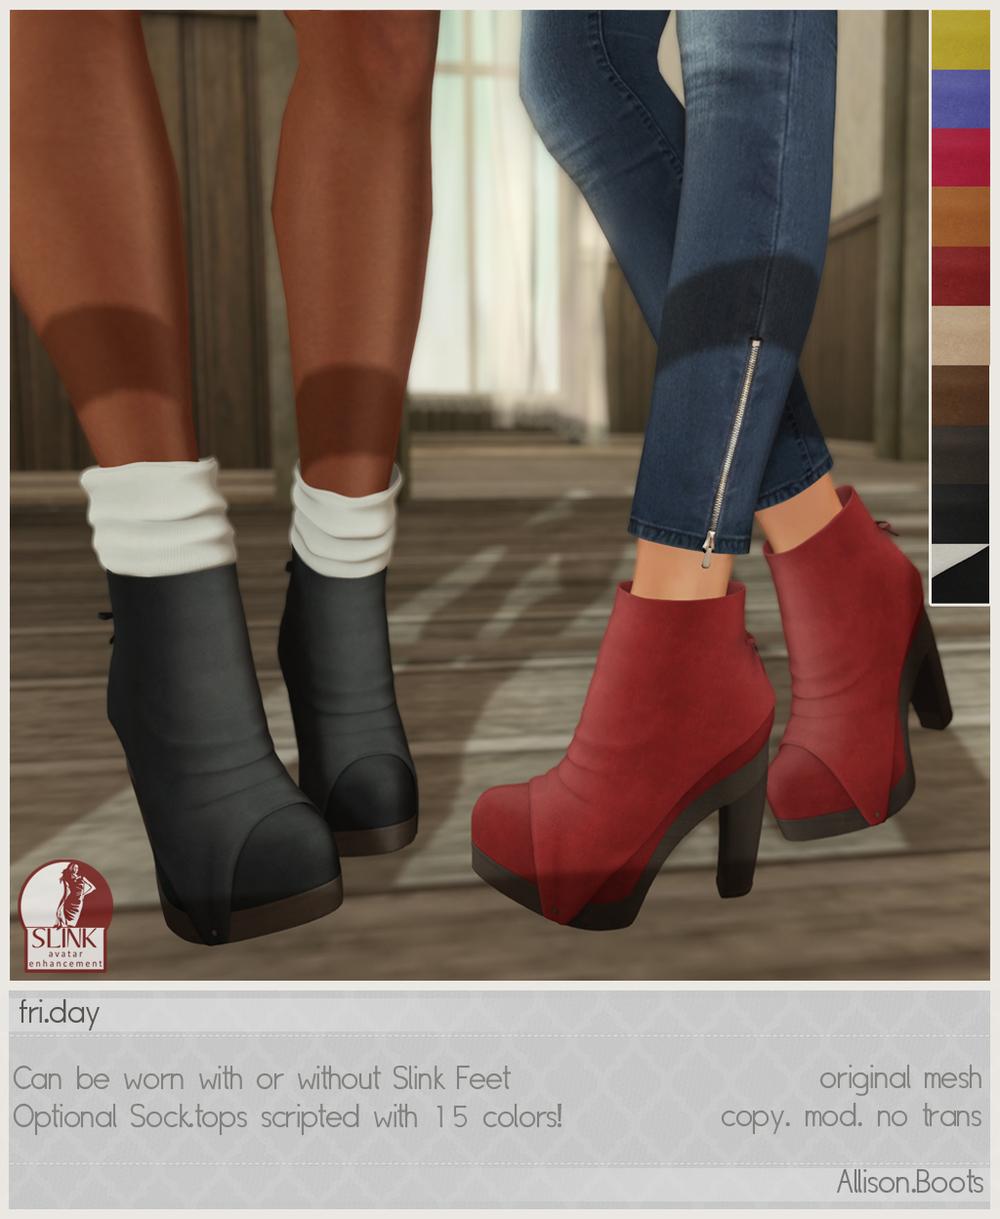 fri - Allison Boots Ad (C88).jpg